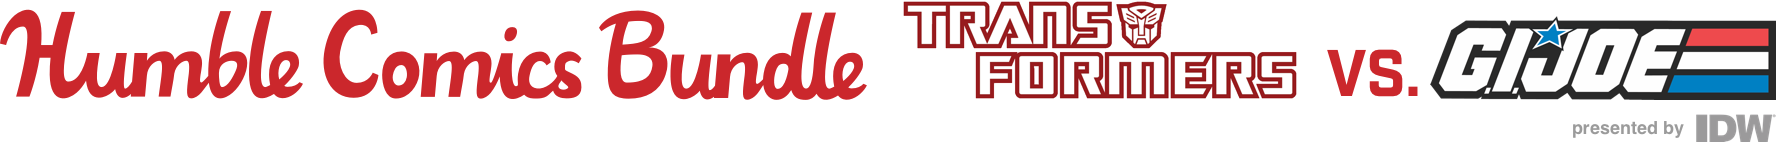 The Humble Comics Bundle: Transformers vs. G.I. Joe presented by IDW